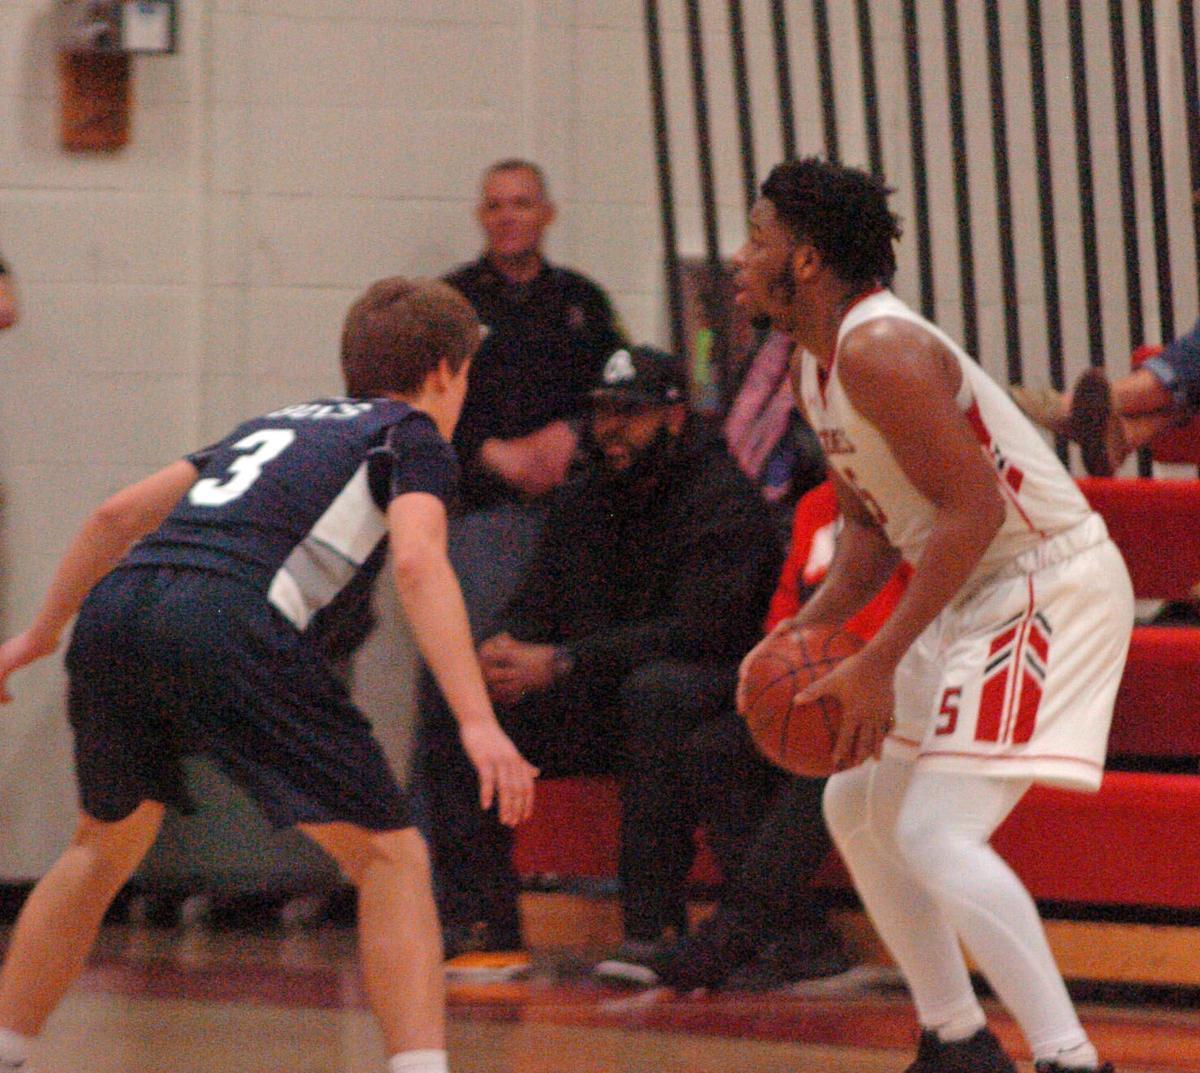 High School Boys' Basketball: Kent Island at Colonel Richardson, Feb. 4, 2019